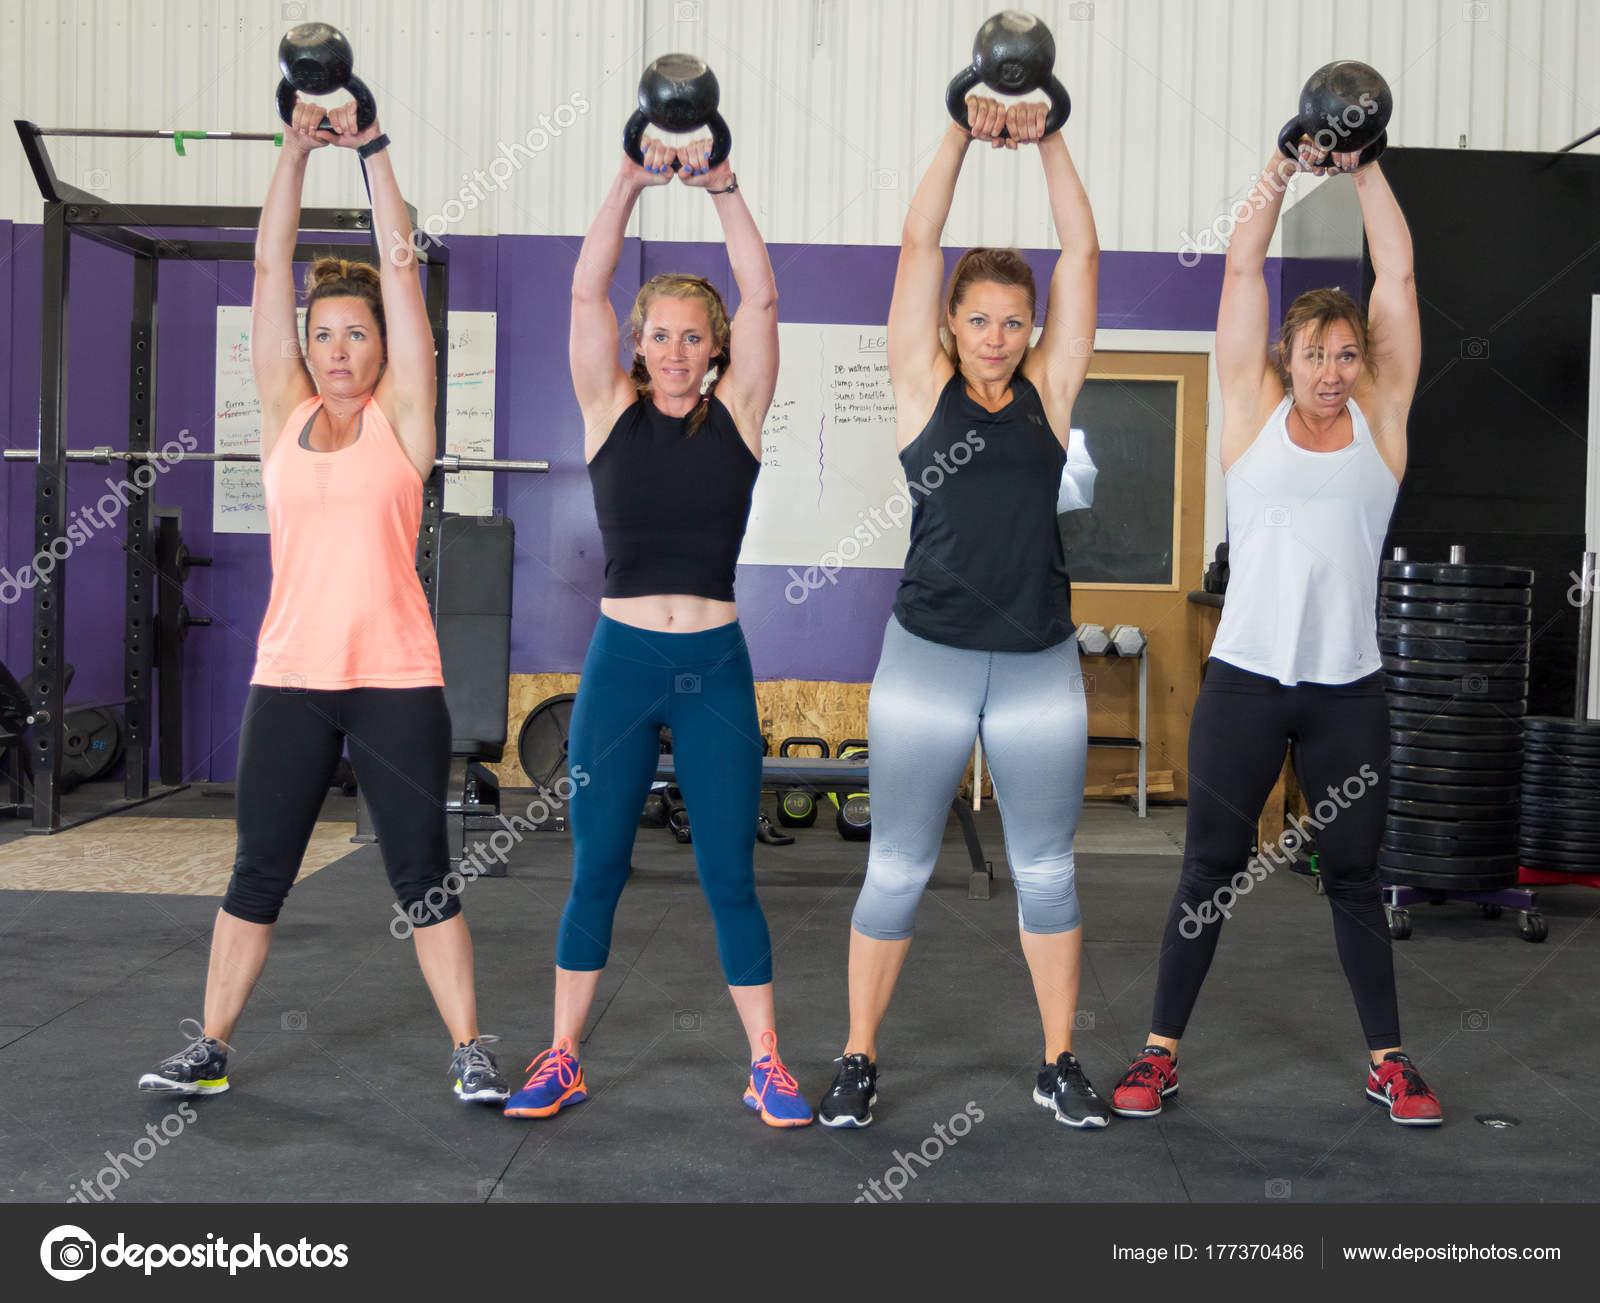 Female at Cross Training Fitness Gym — Stock Photo © joshuarainey #177370486